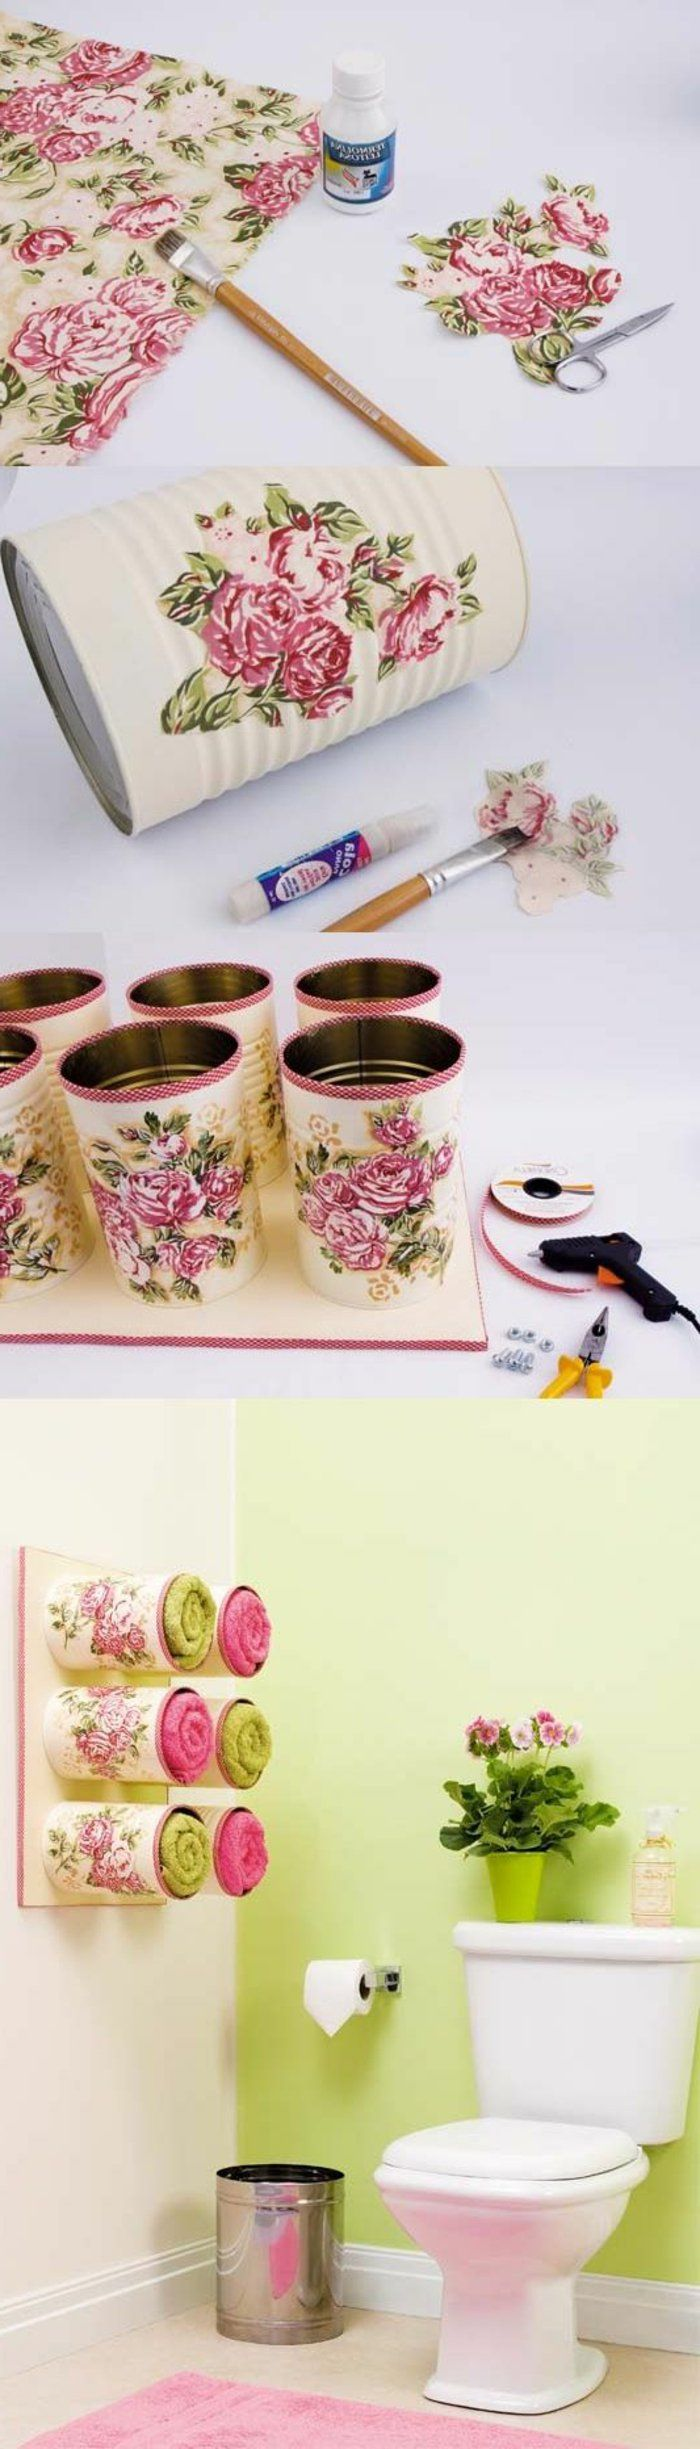 serviettentechnik anleitung, konserven, servietten mit pinken rosen, schere, pinsel, serviettenkleber